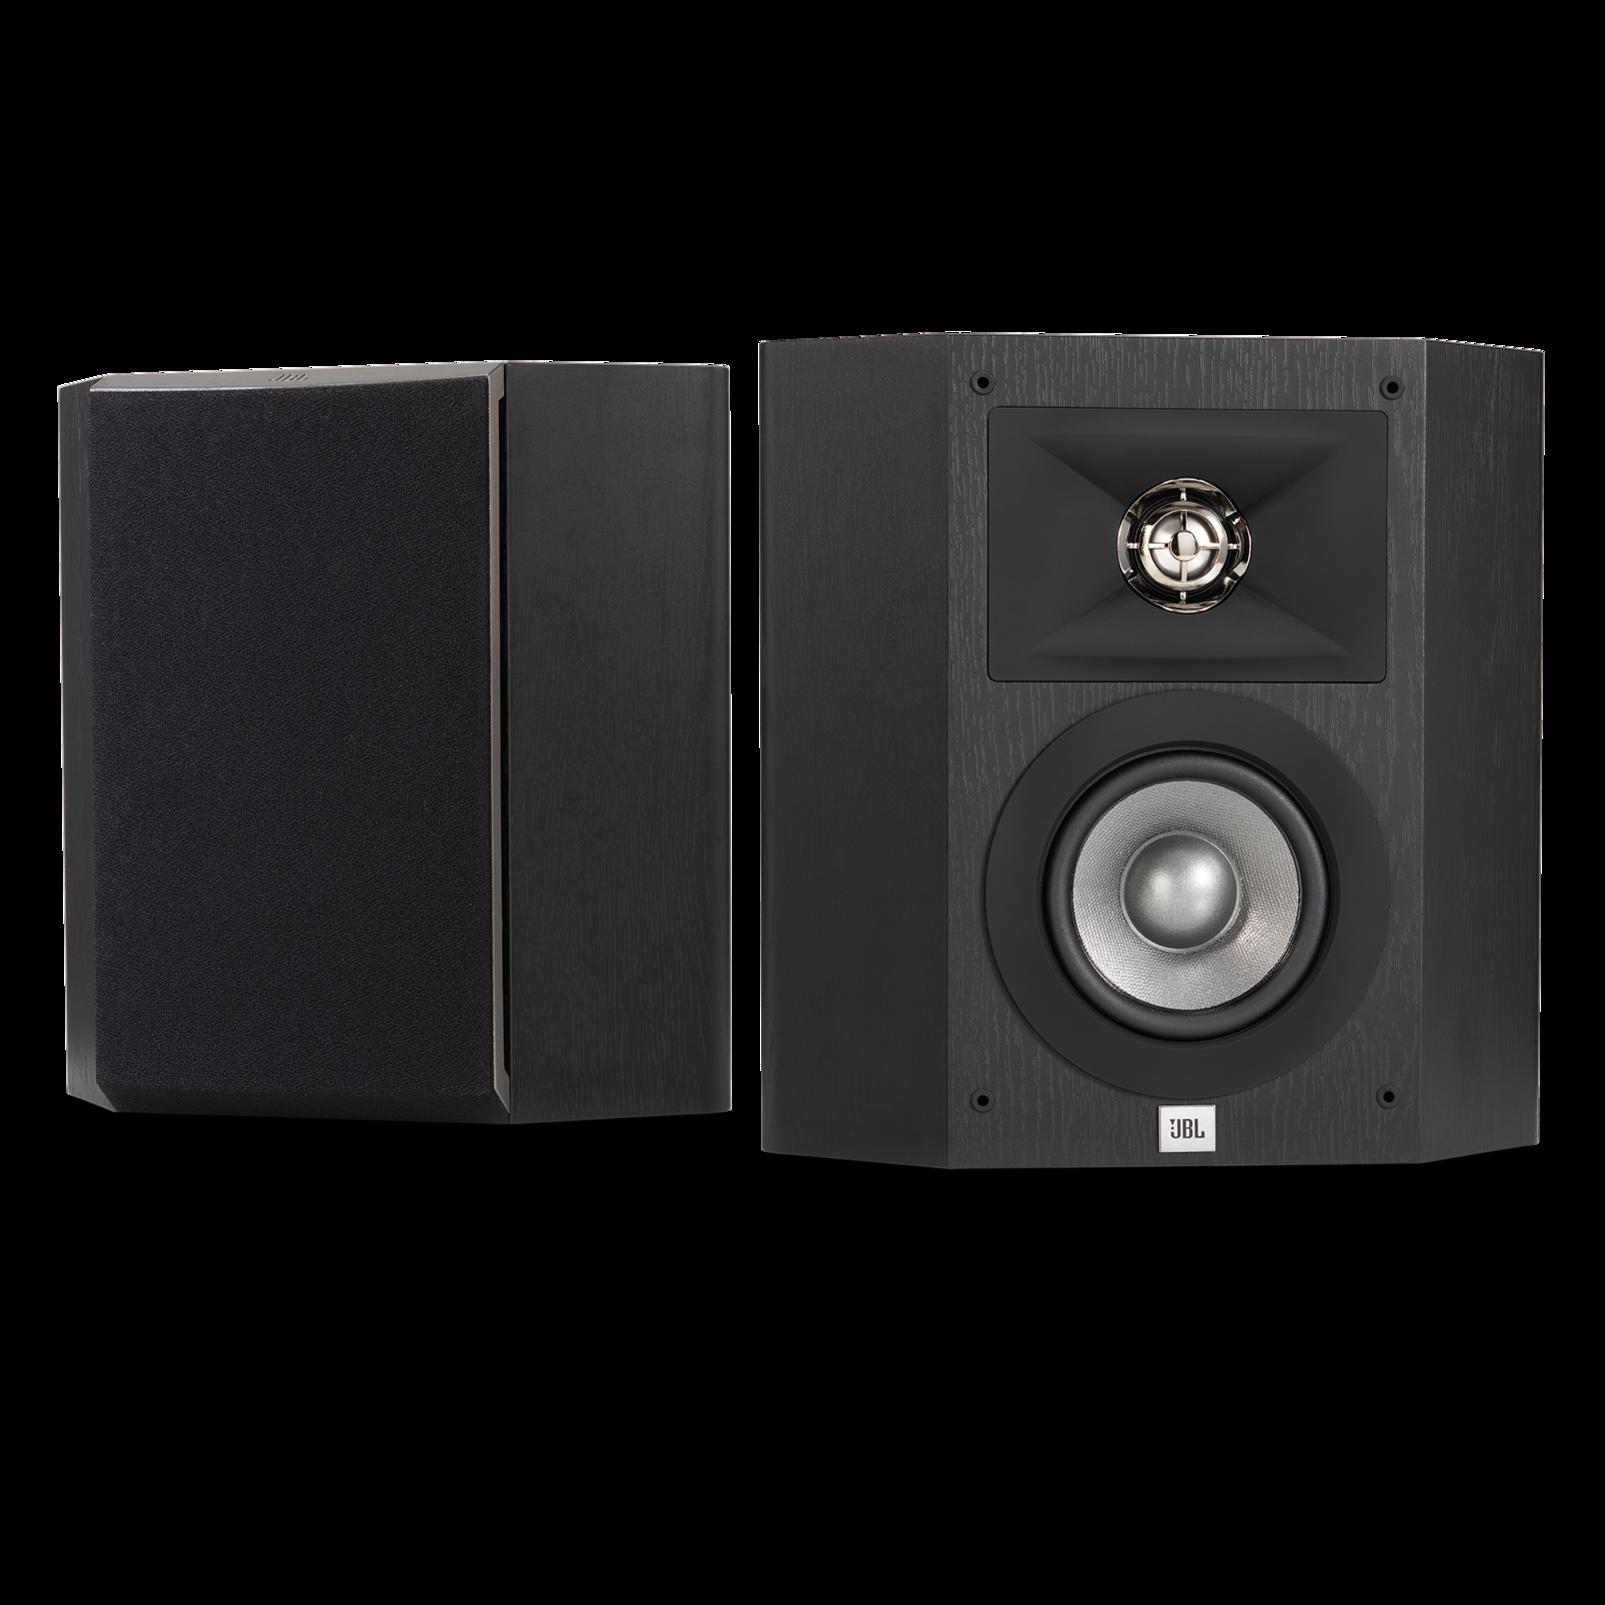 Studio 210 | Stylish 2-way 4 inch Surround Speakers